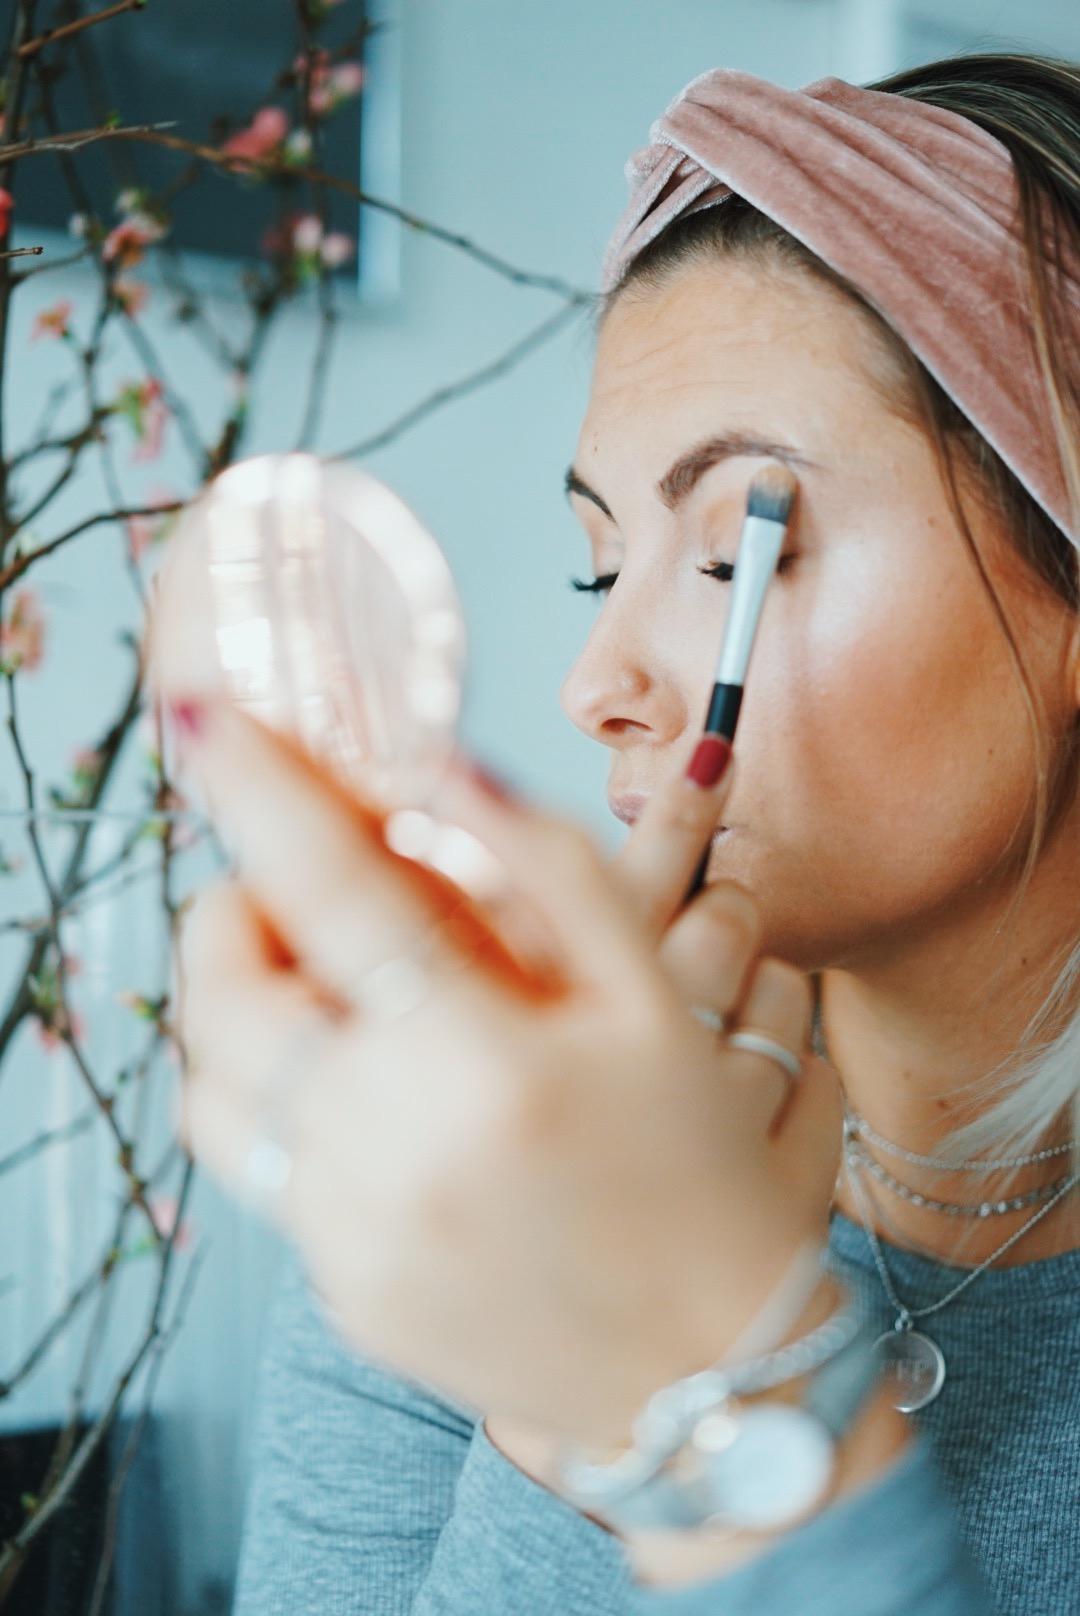 eos-shimmer-beauty-auffrischen-to-go-highlighter-fashion-for-ffranzy-beautyblogger-koeln